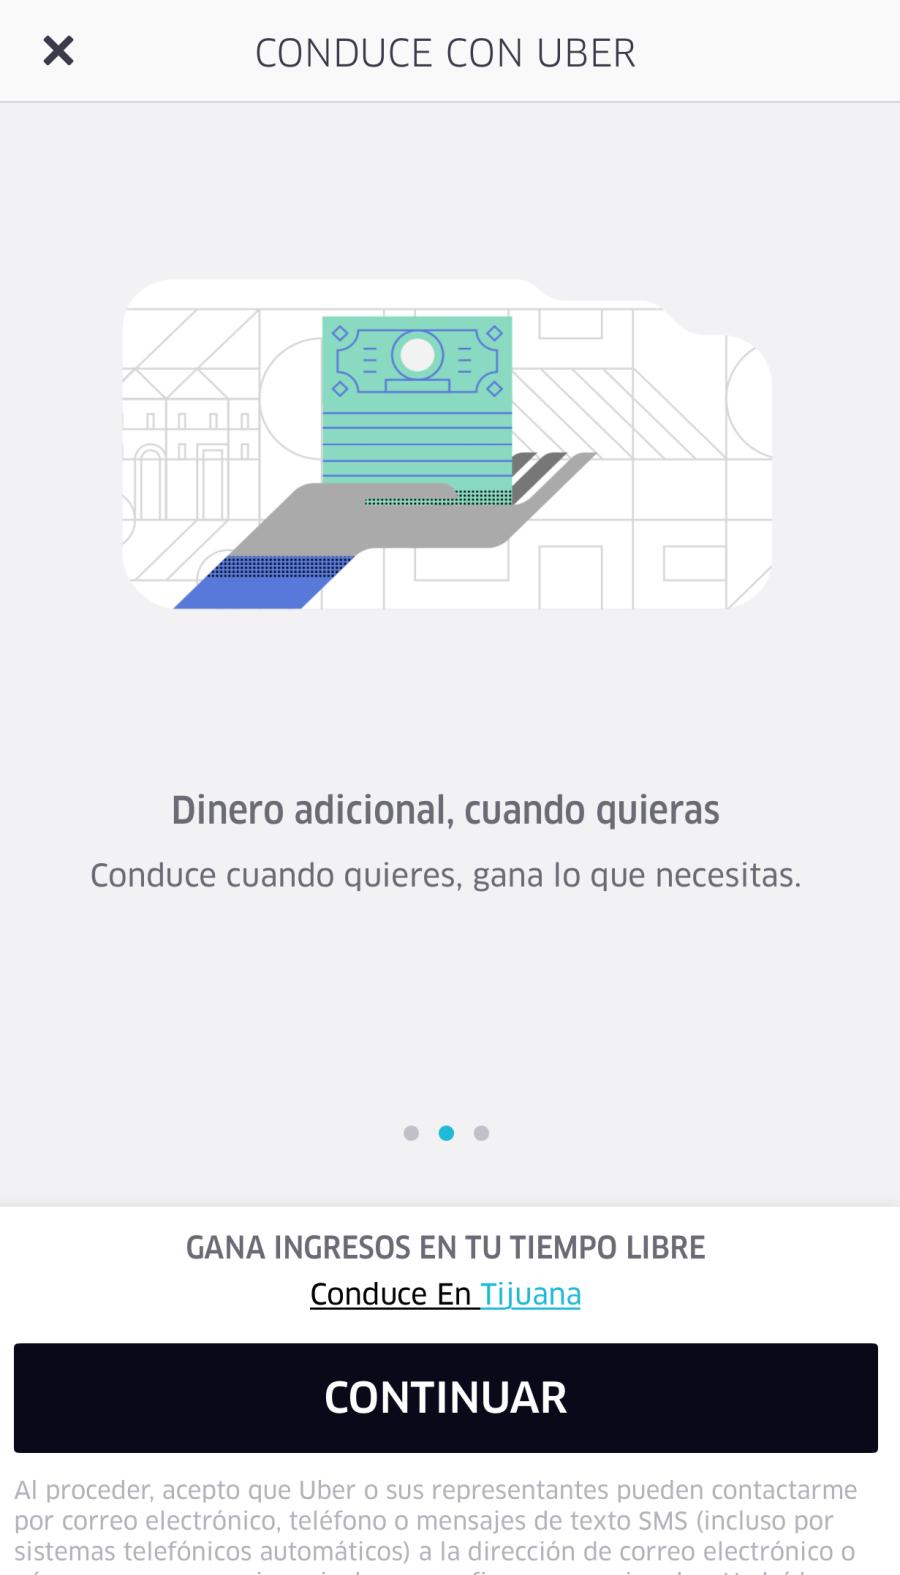 conduce-con-uber-tijuana-jms